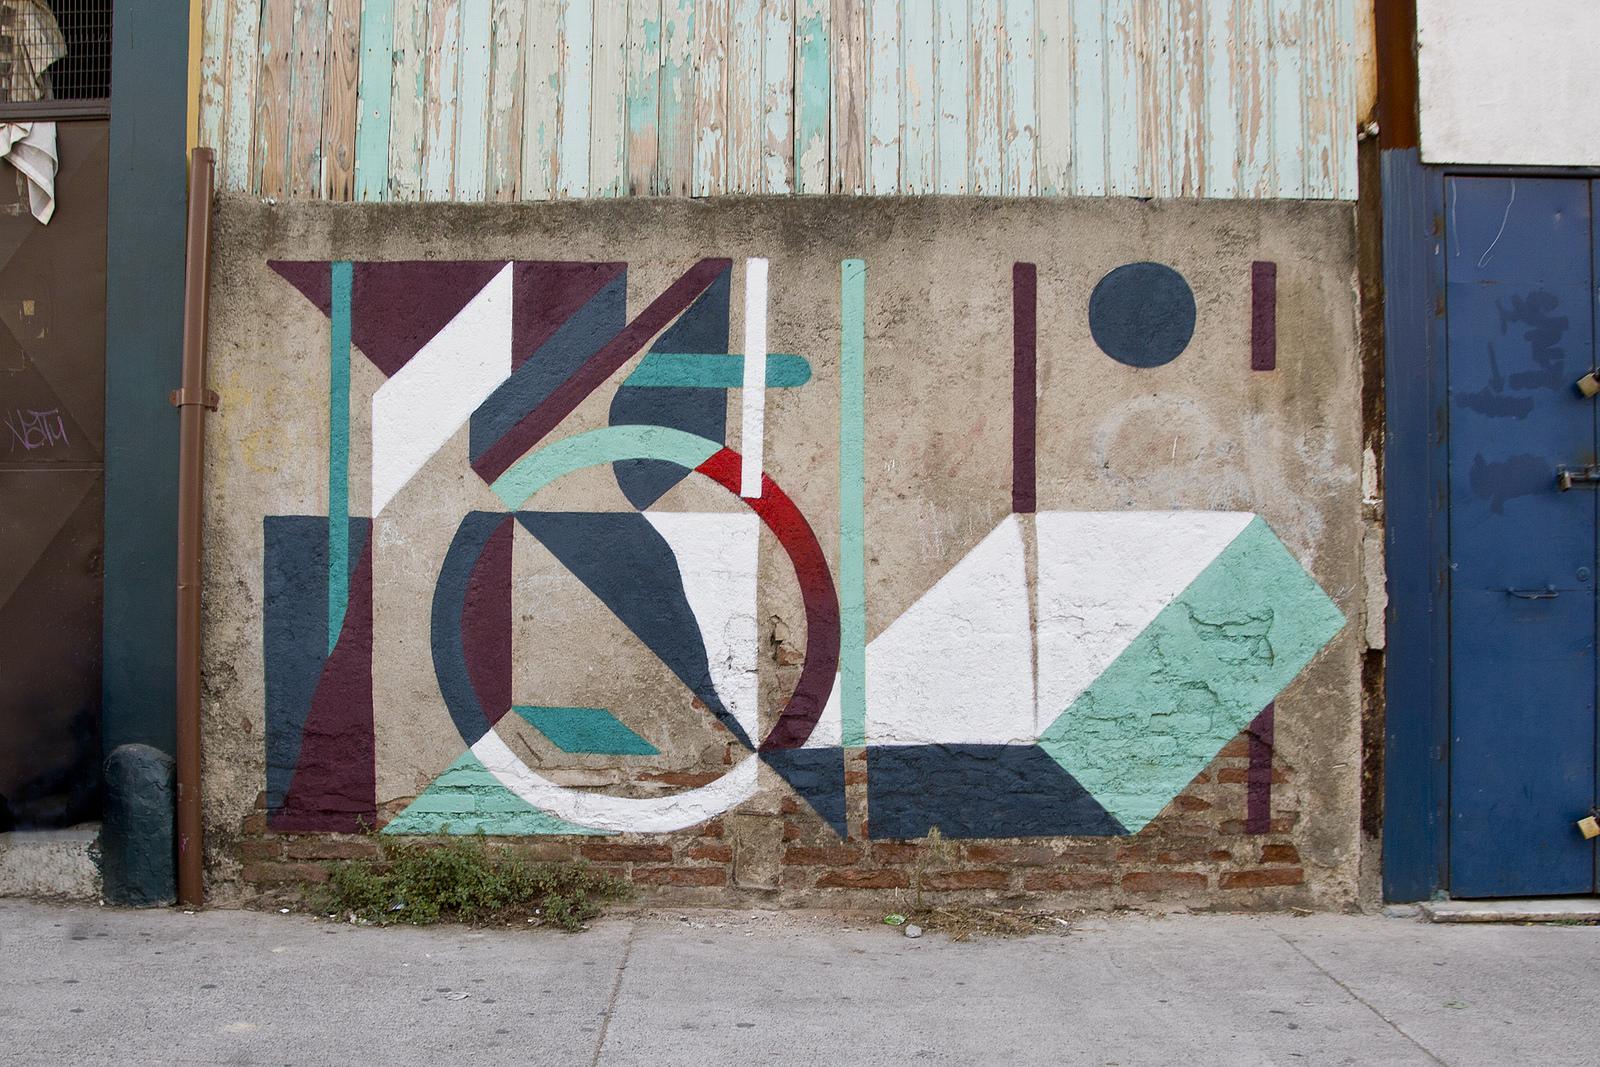 nelio-series-of-new-pieces-in-chile-04